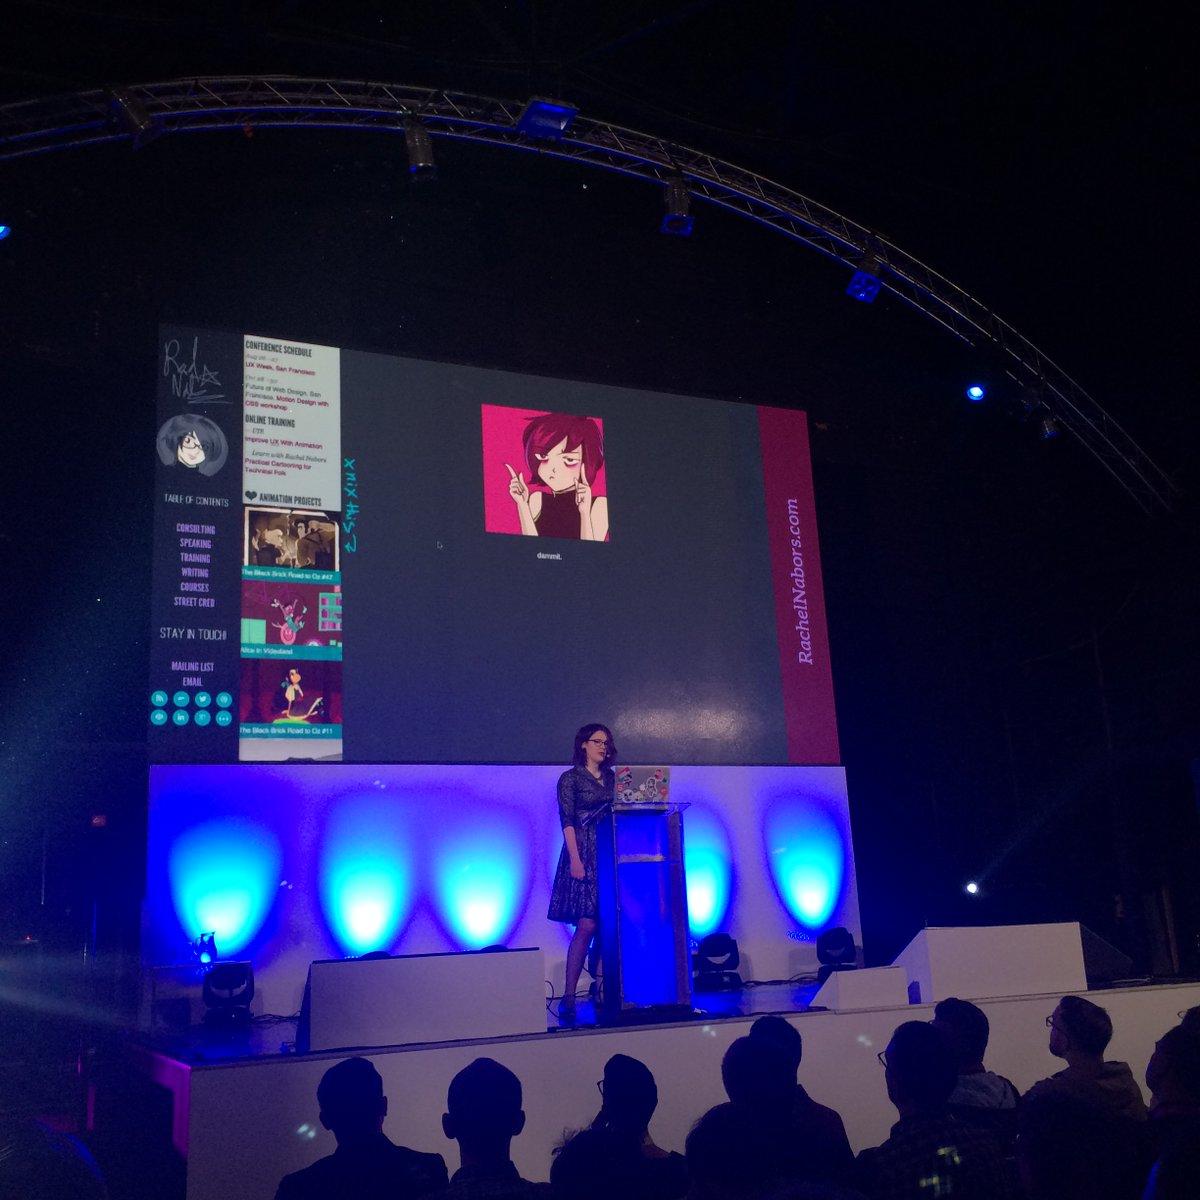 @rachelnabors onstage! https://t.co/8lDraPZdQU